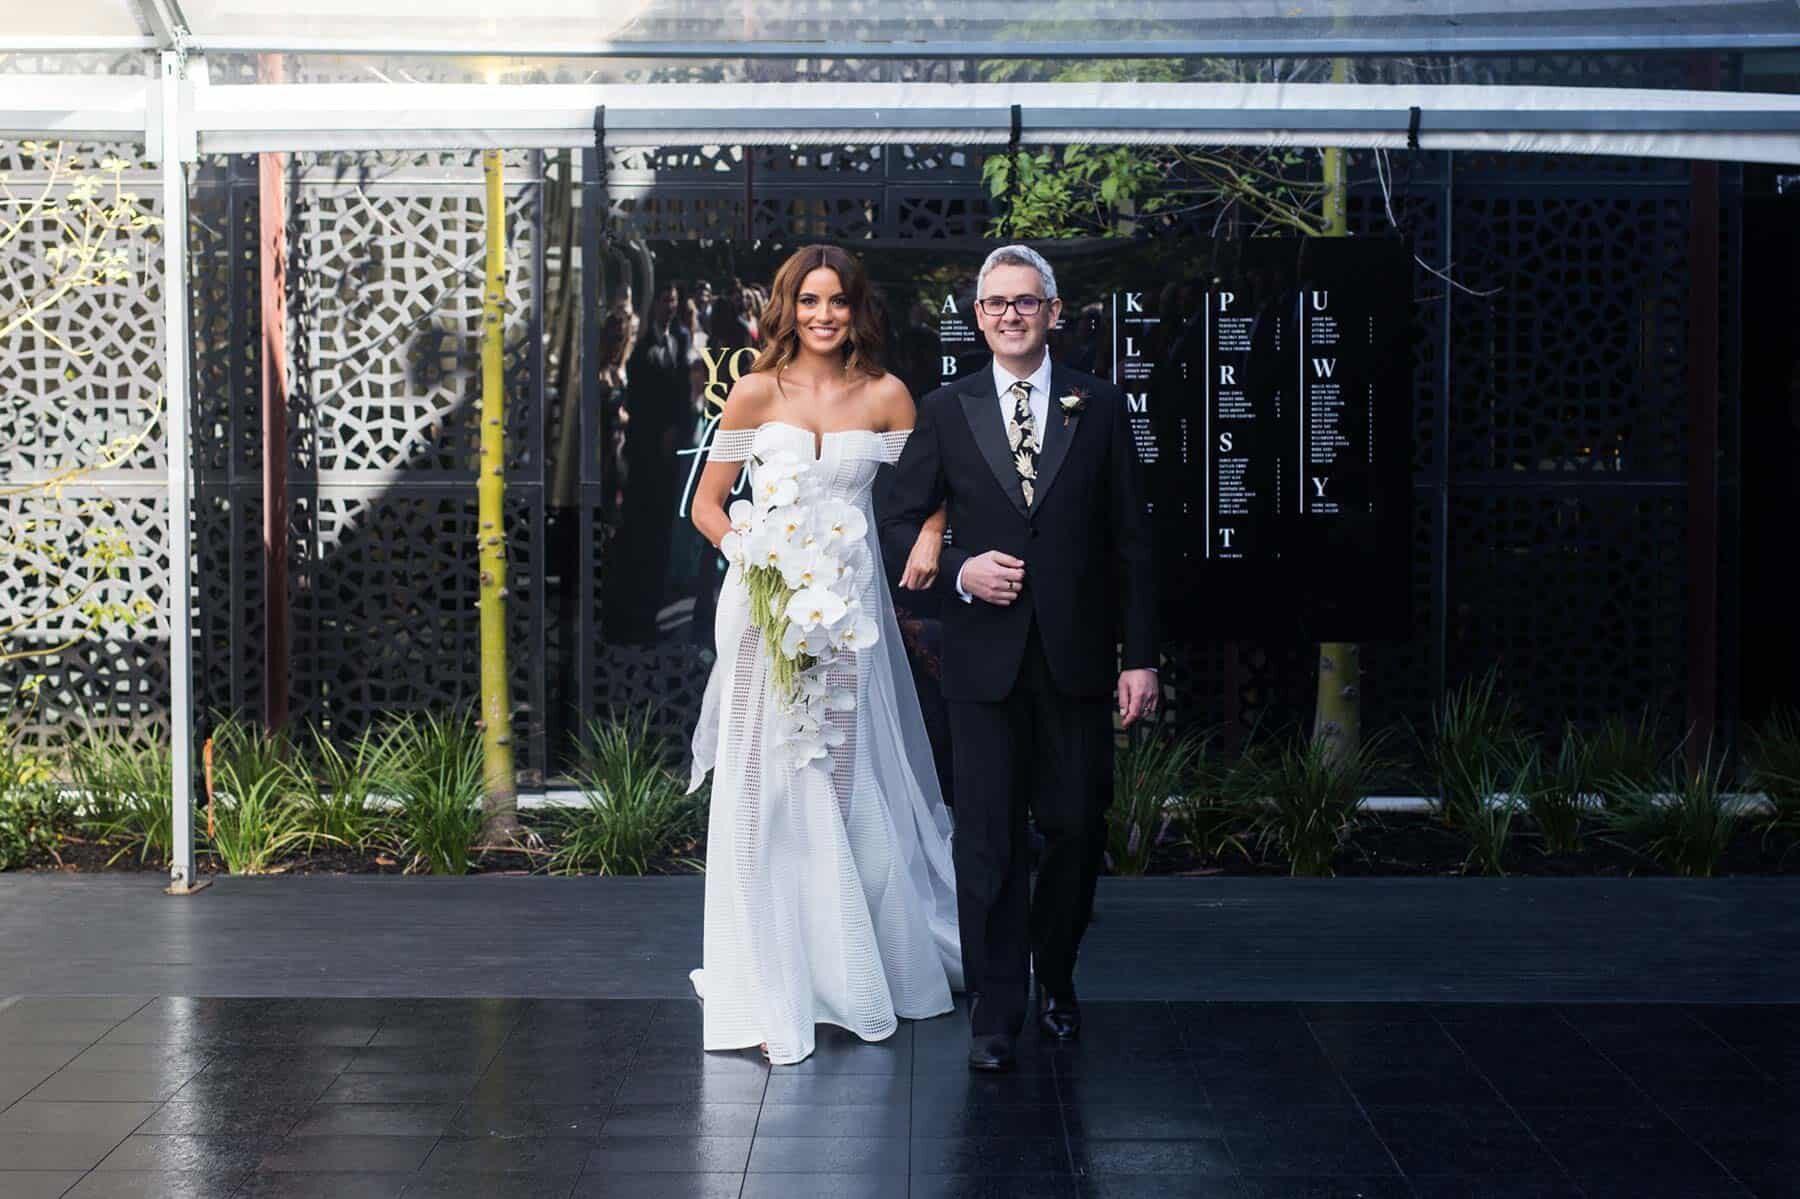 modern Melbourne wedding at St Kilda venue The Prince Hotel